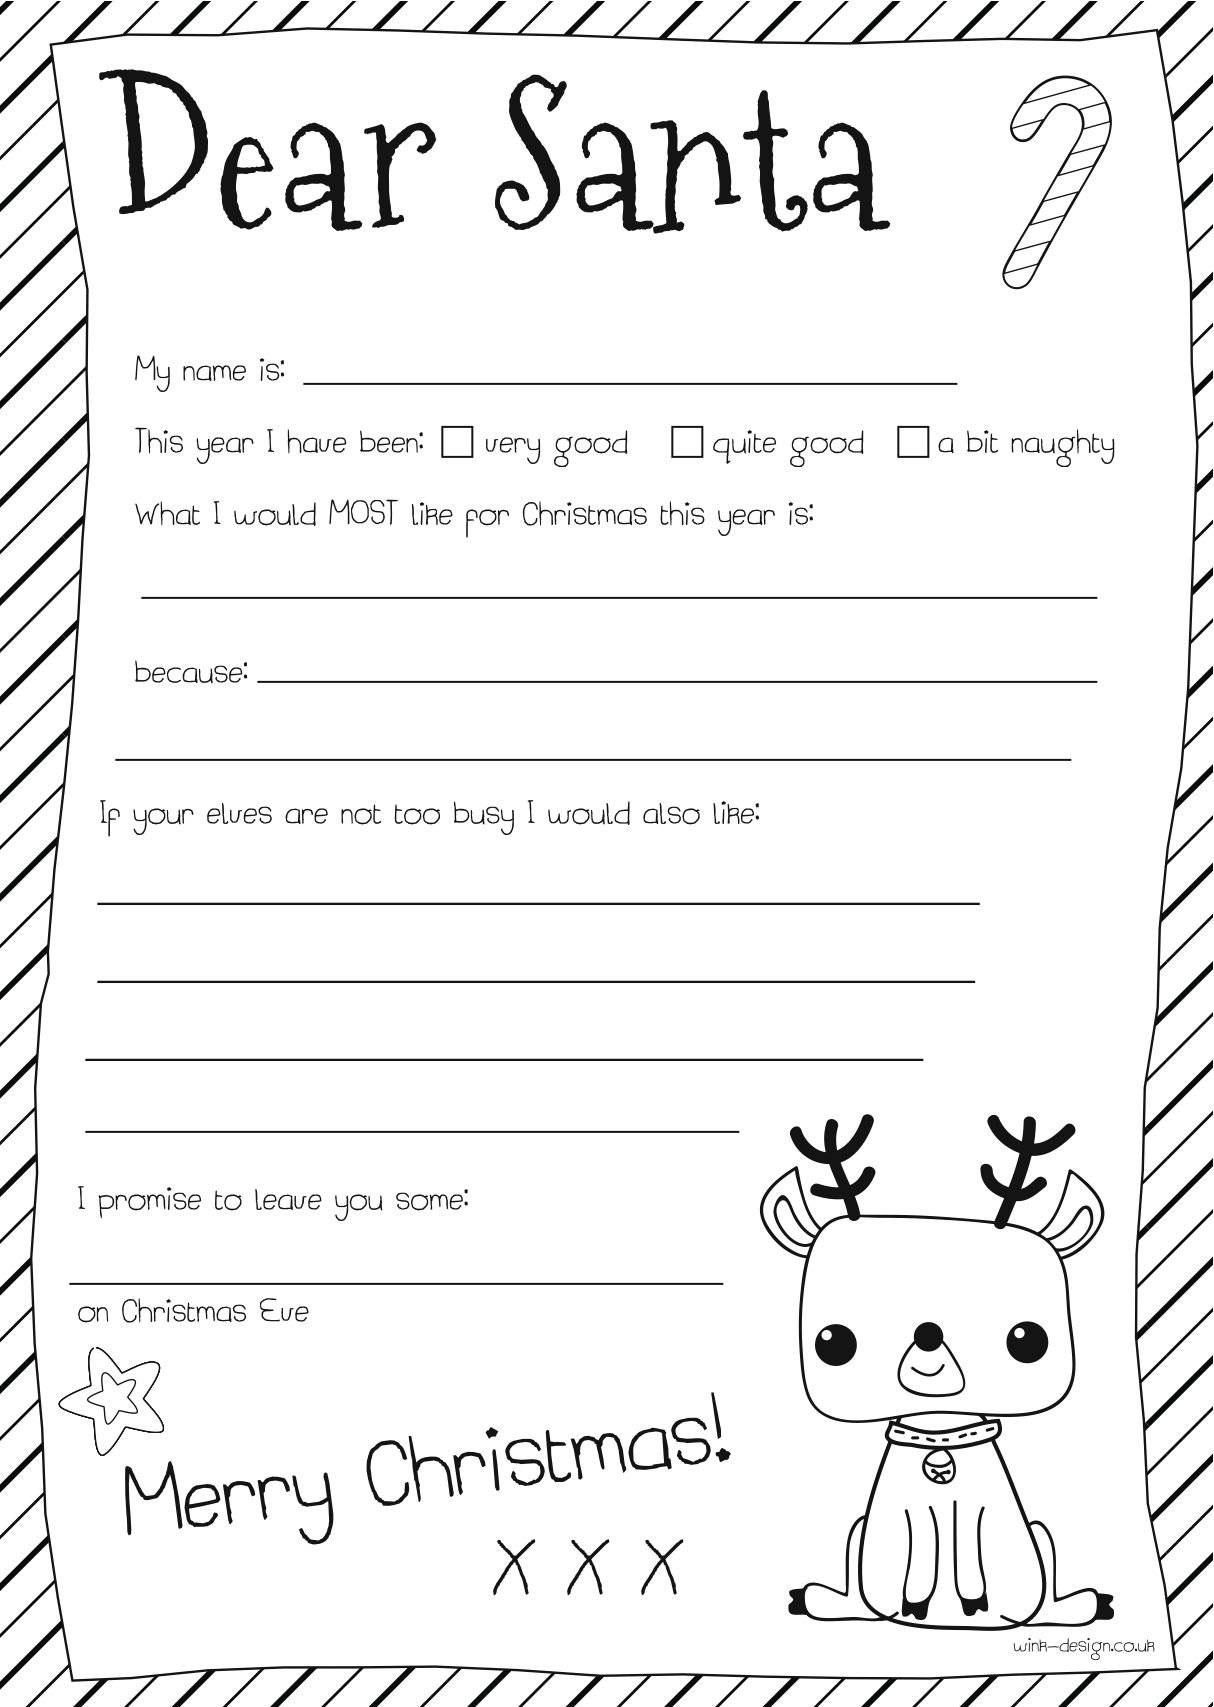 dear santa letter Christmas Let's Talk About/To Santa